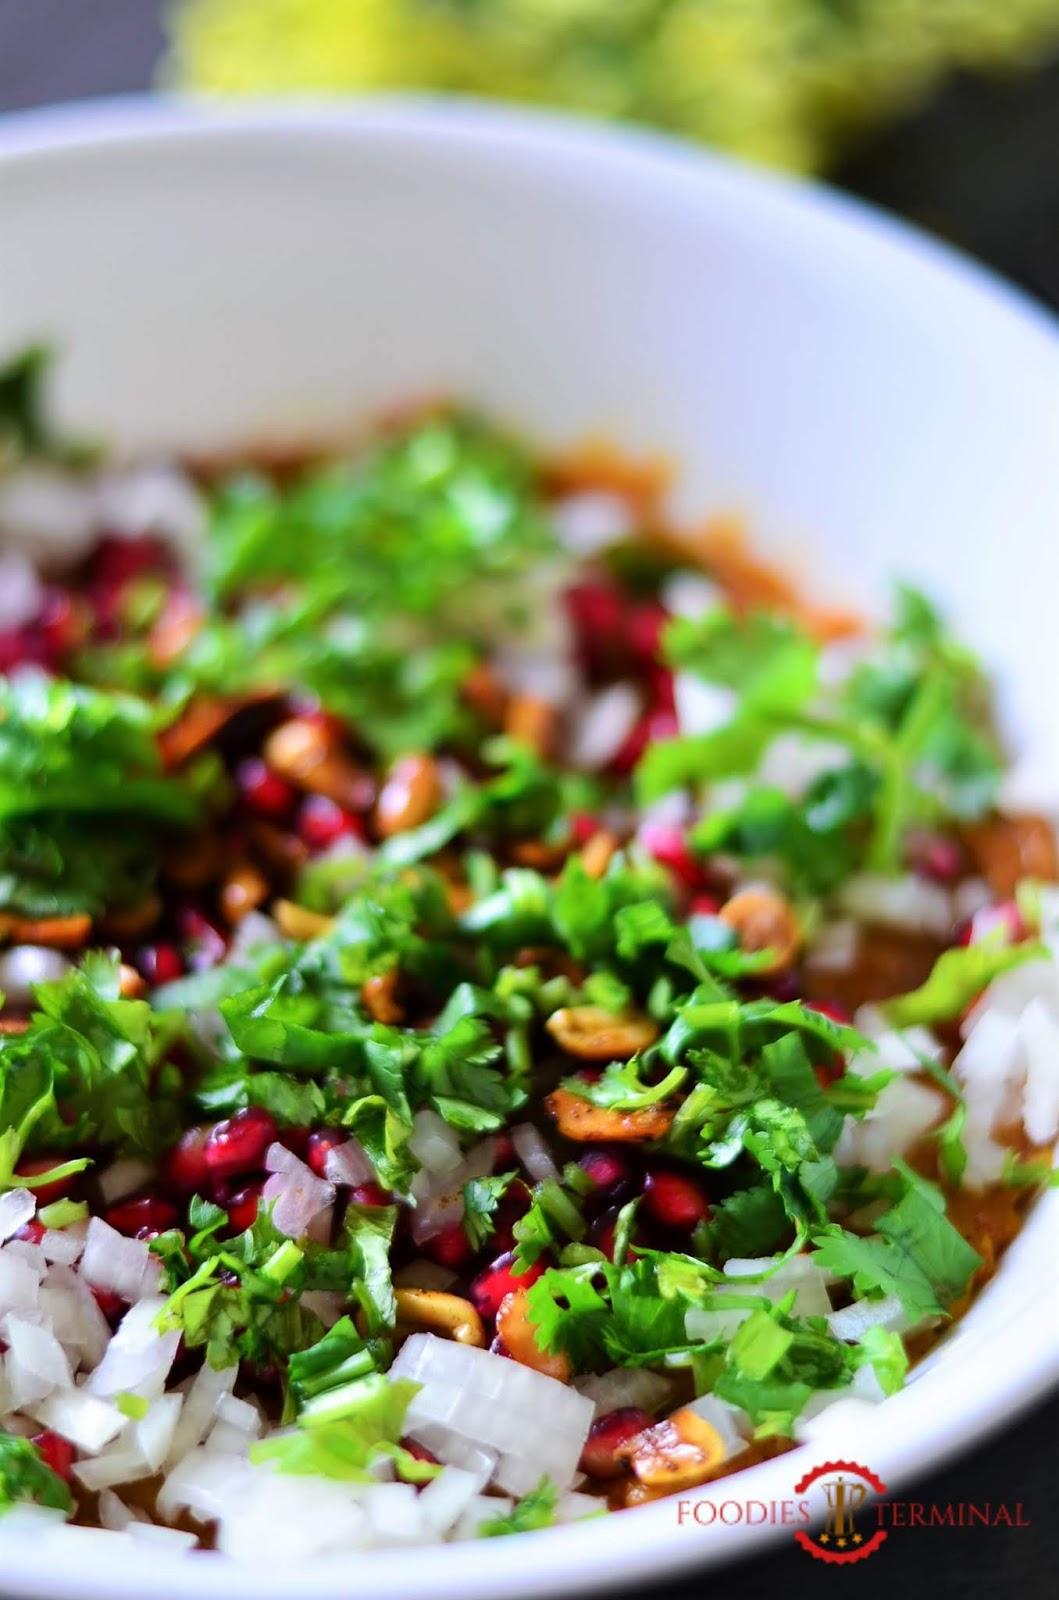 The Potato filling of Kutchi dabeli garmished with fresh pomegranate seeds, masala peanuts, fresh cilantro and chopped onion.